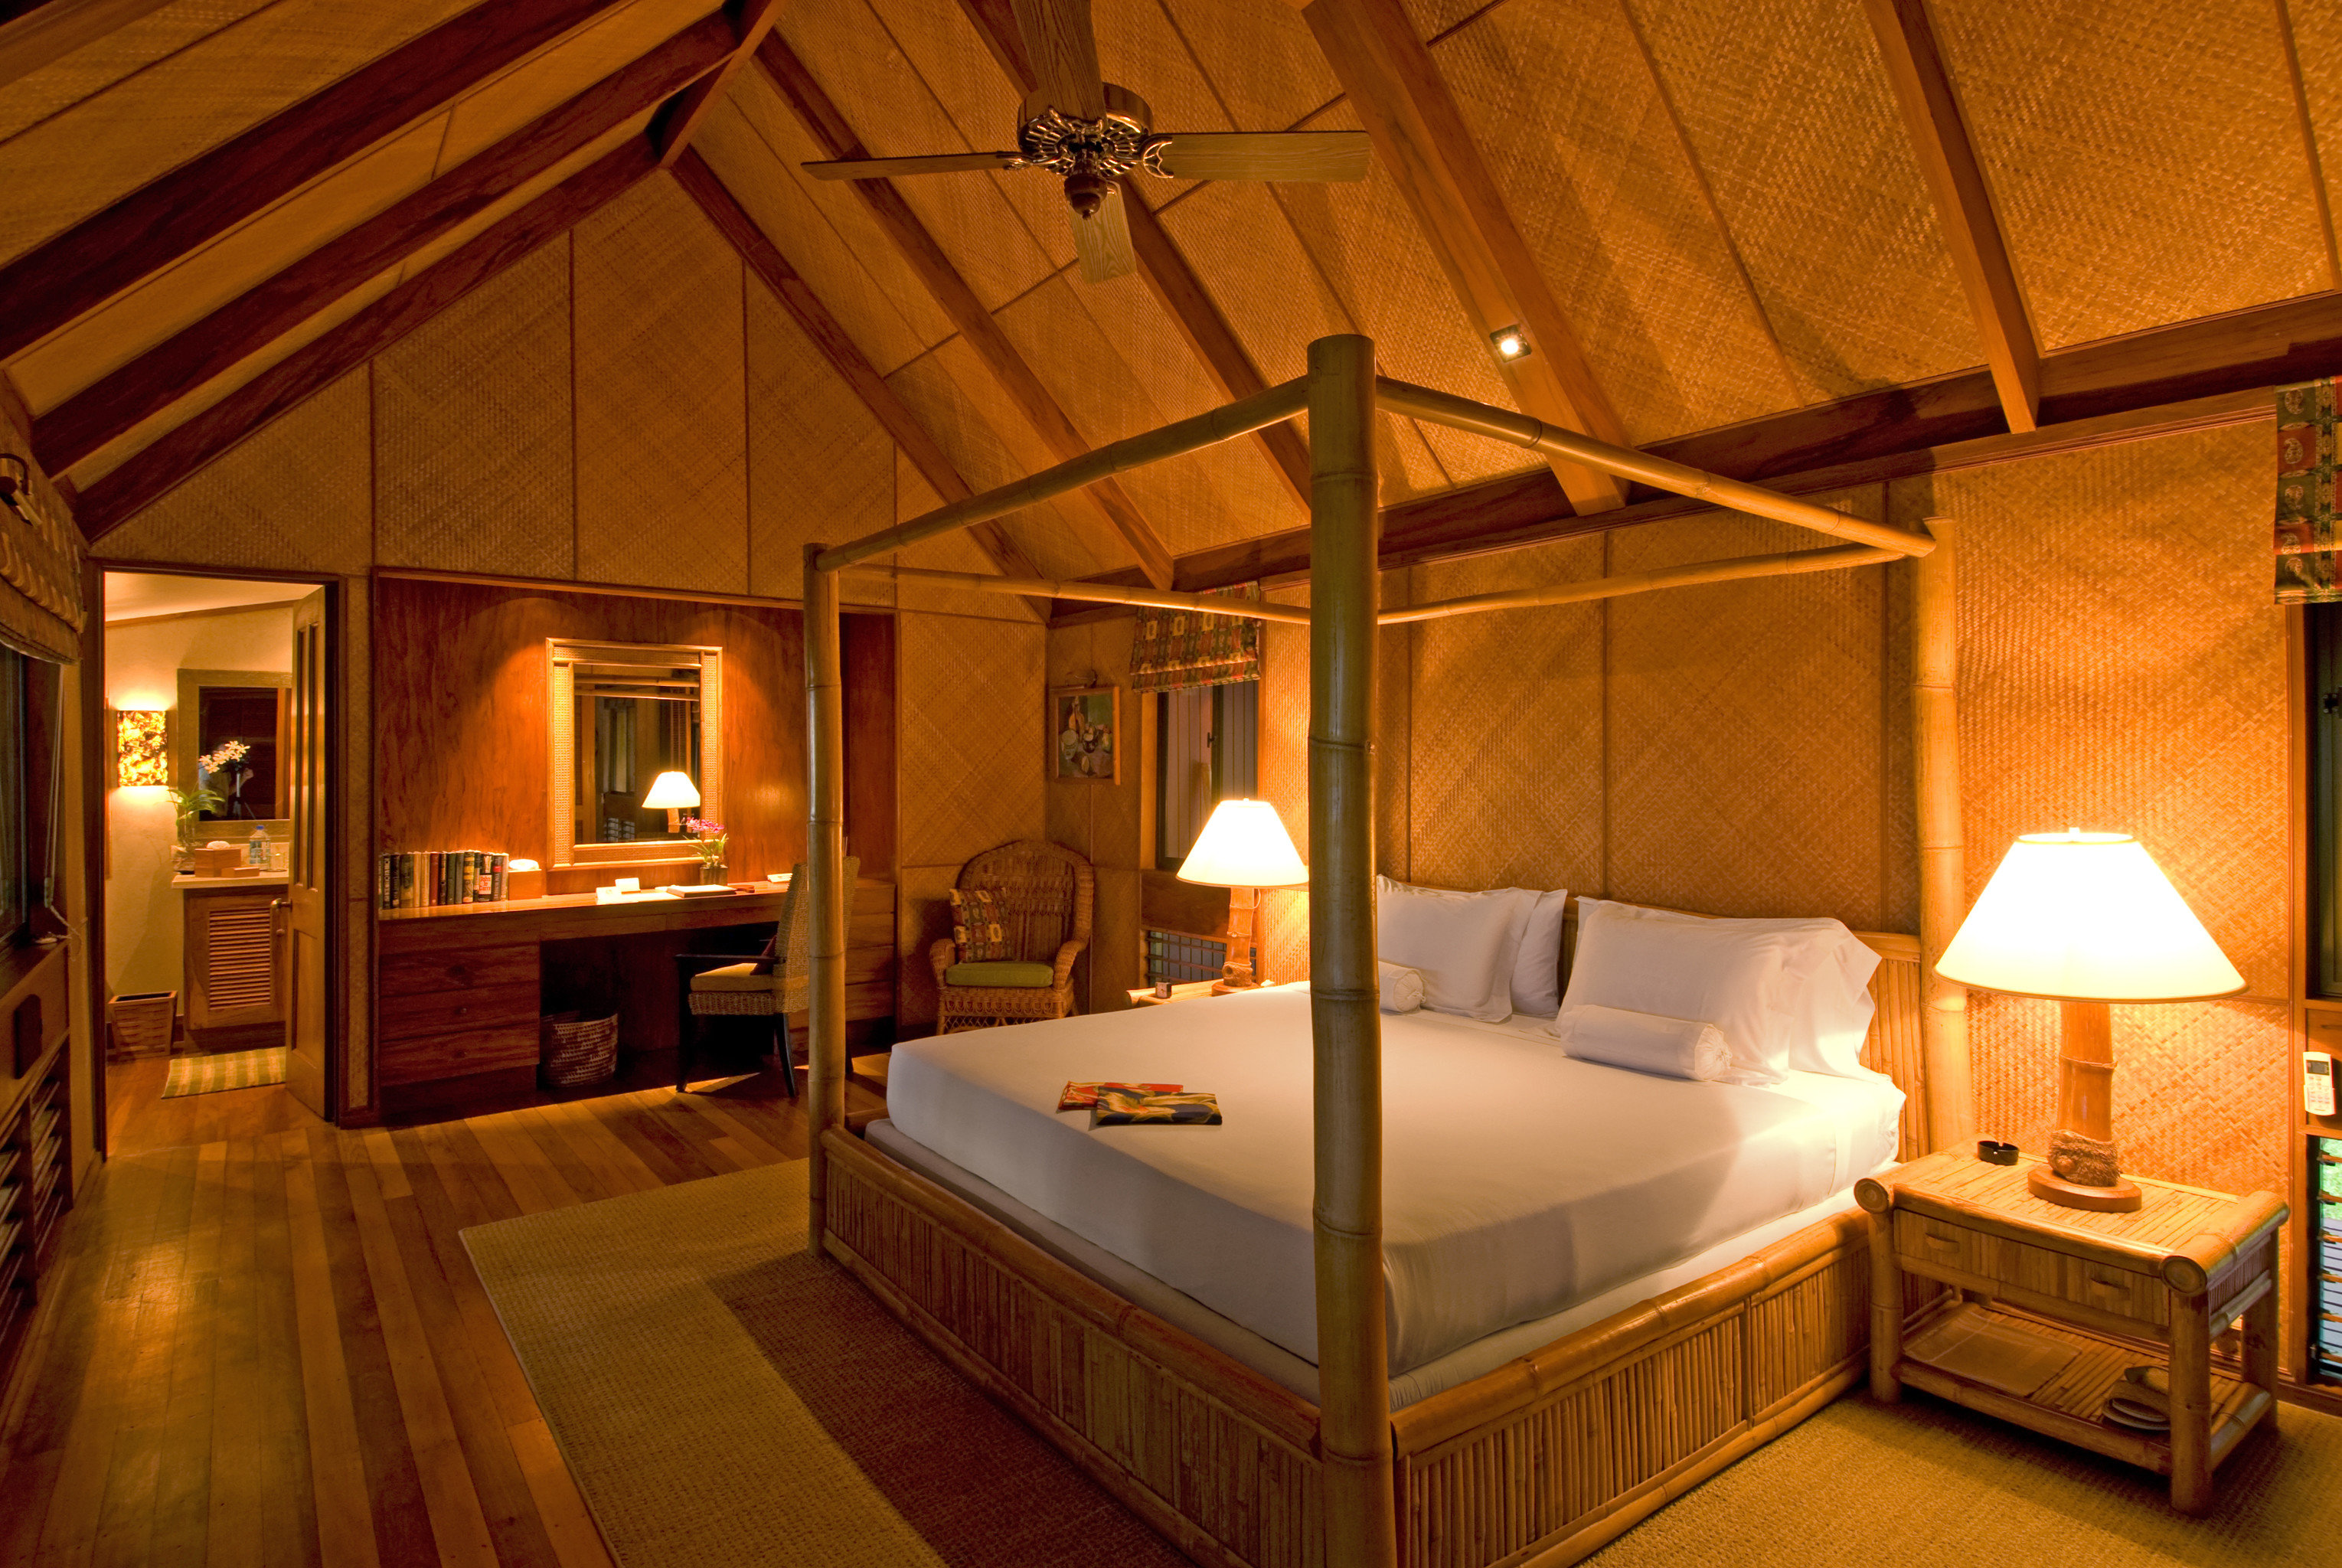 Bedroom Honeymoon Luxury Romance Suite property building house cottage home Villa Resort mansion farmhouse